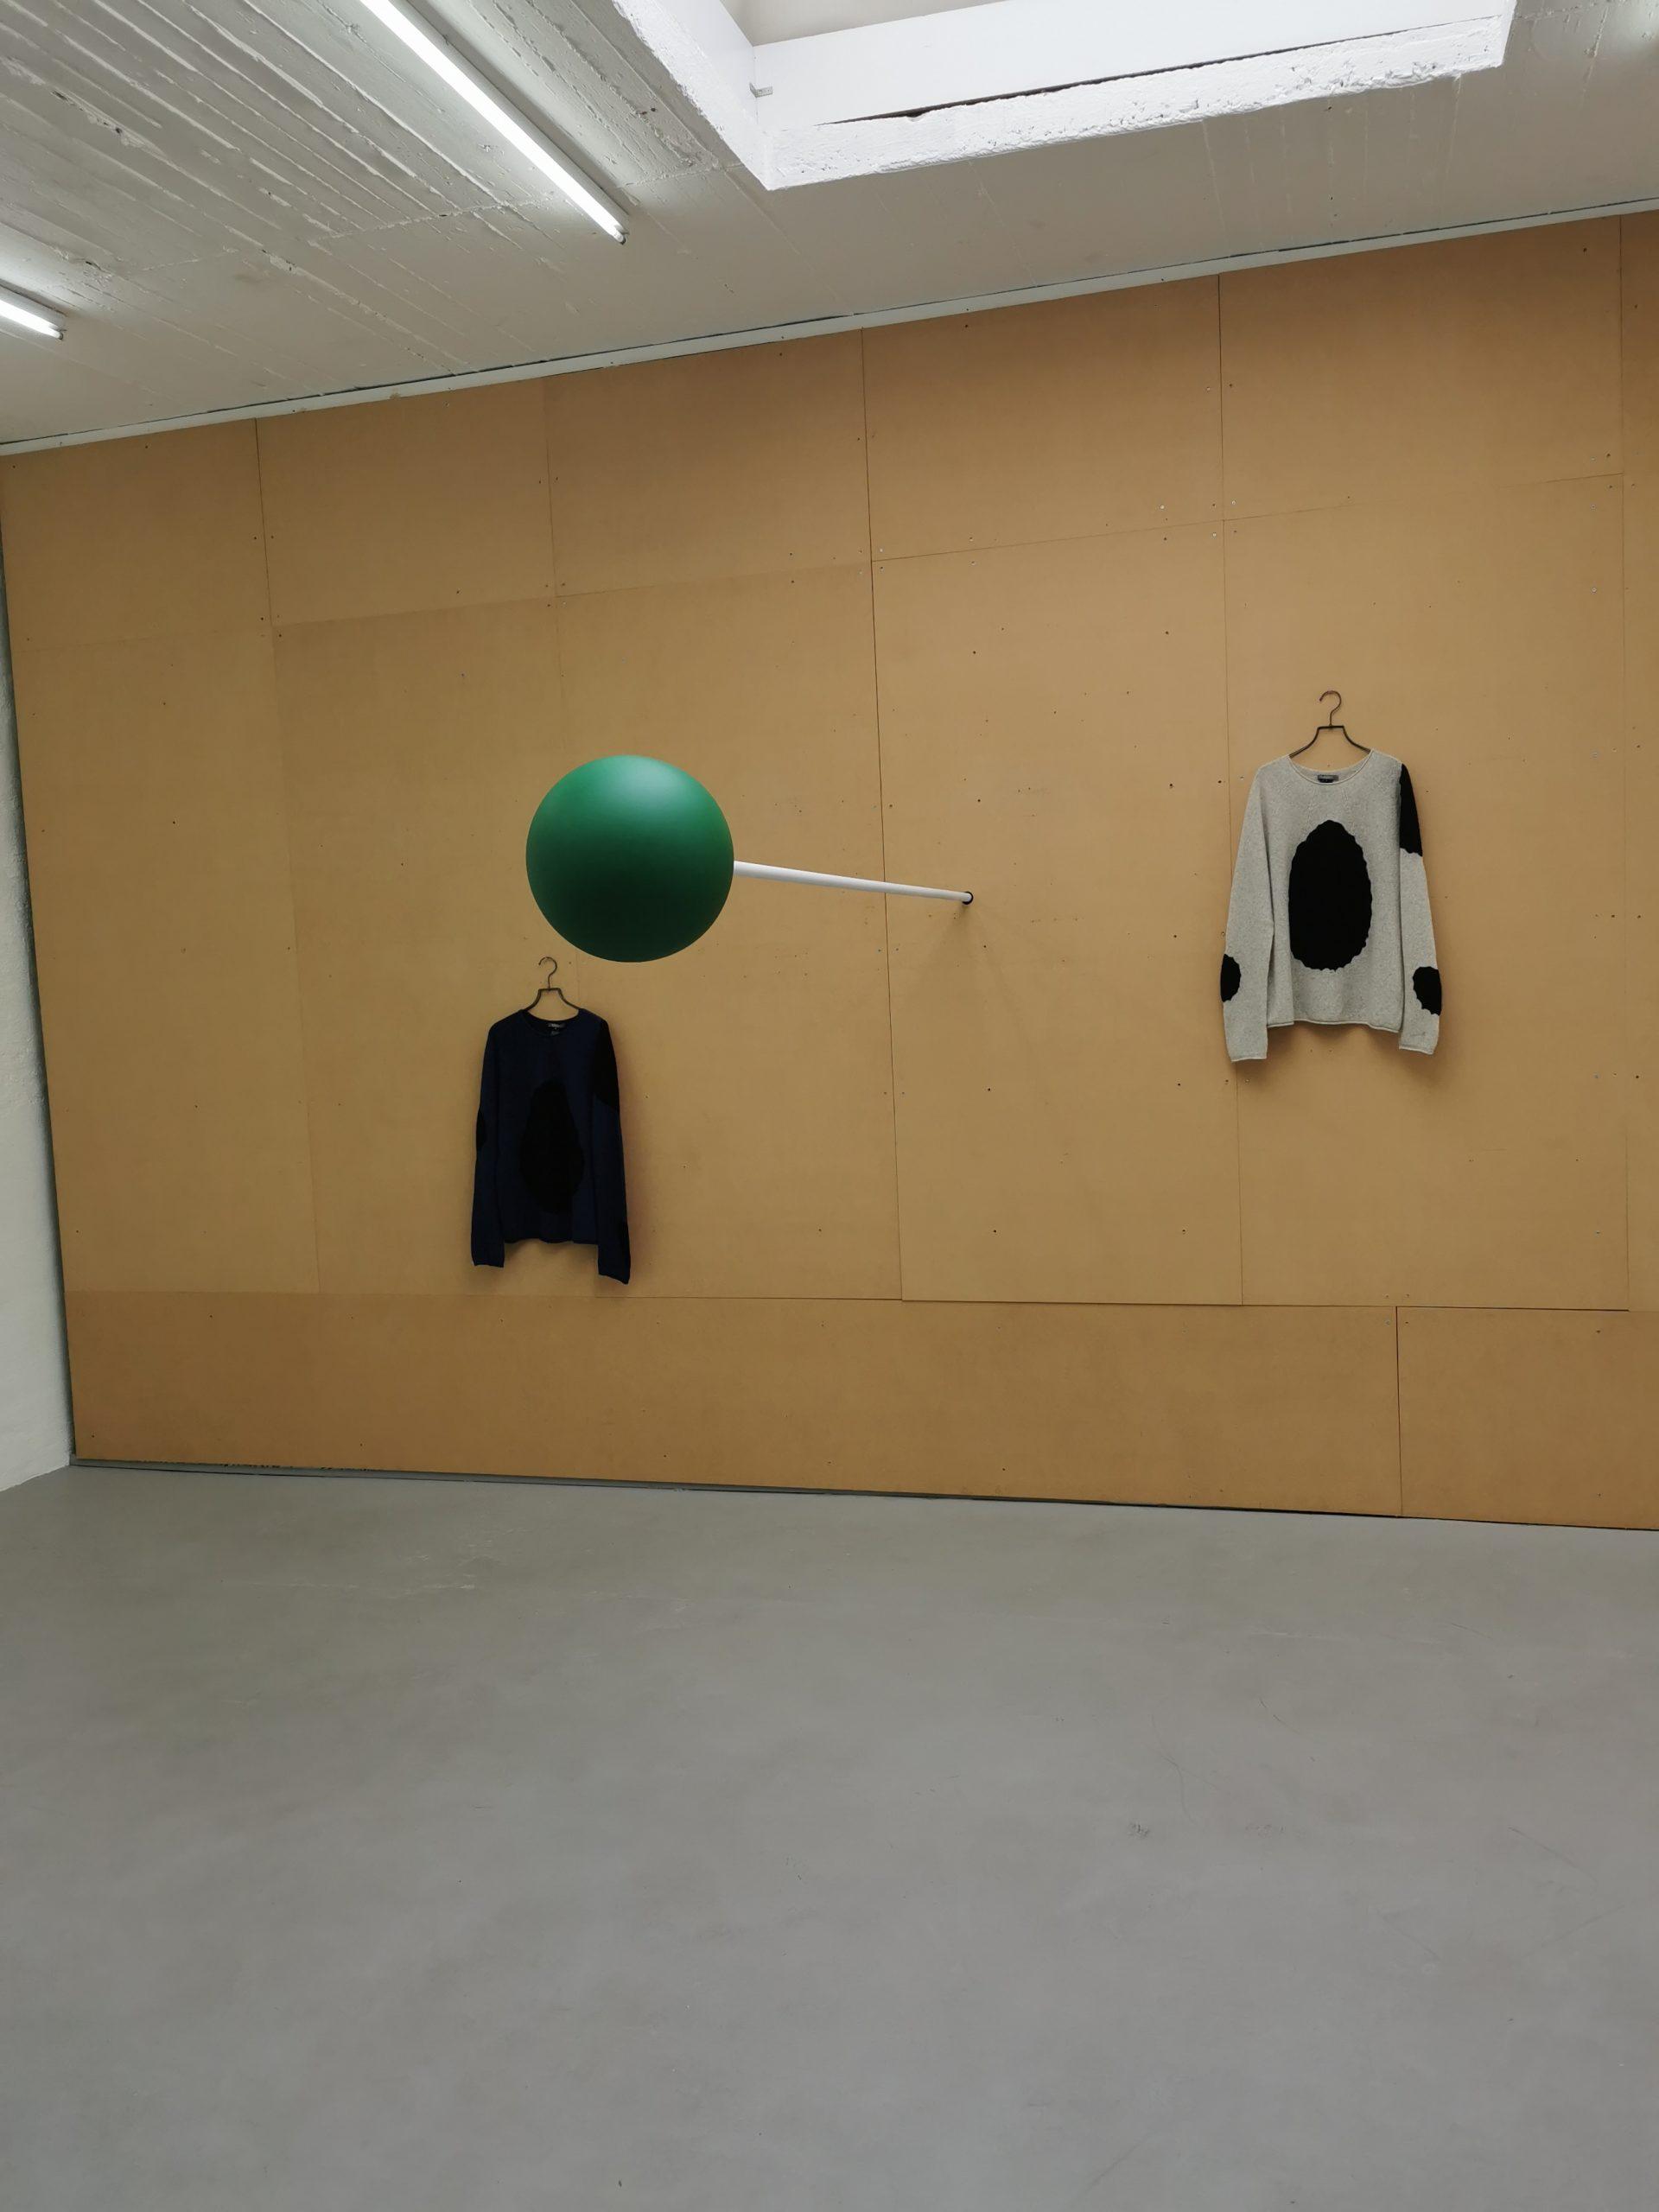 Through the Düsseldorf art studio jungle